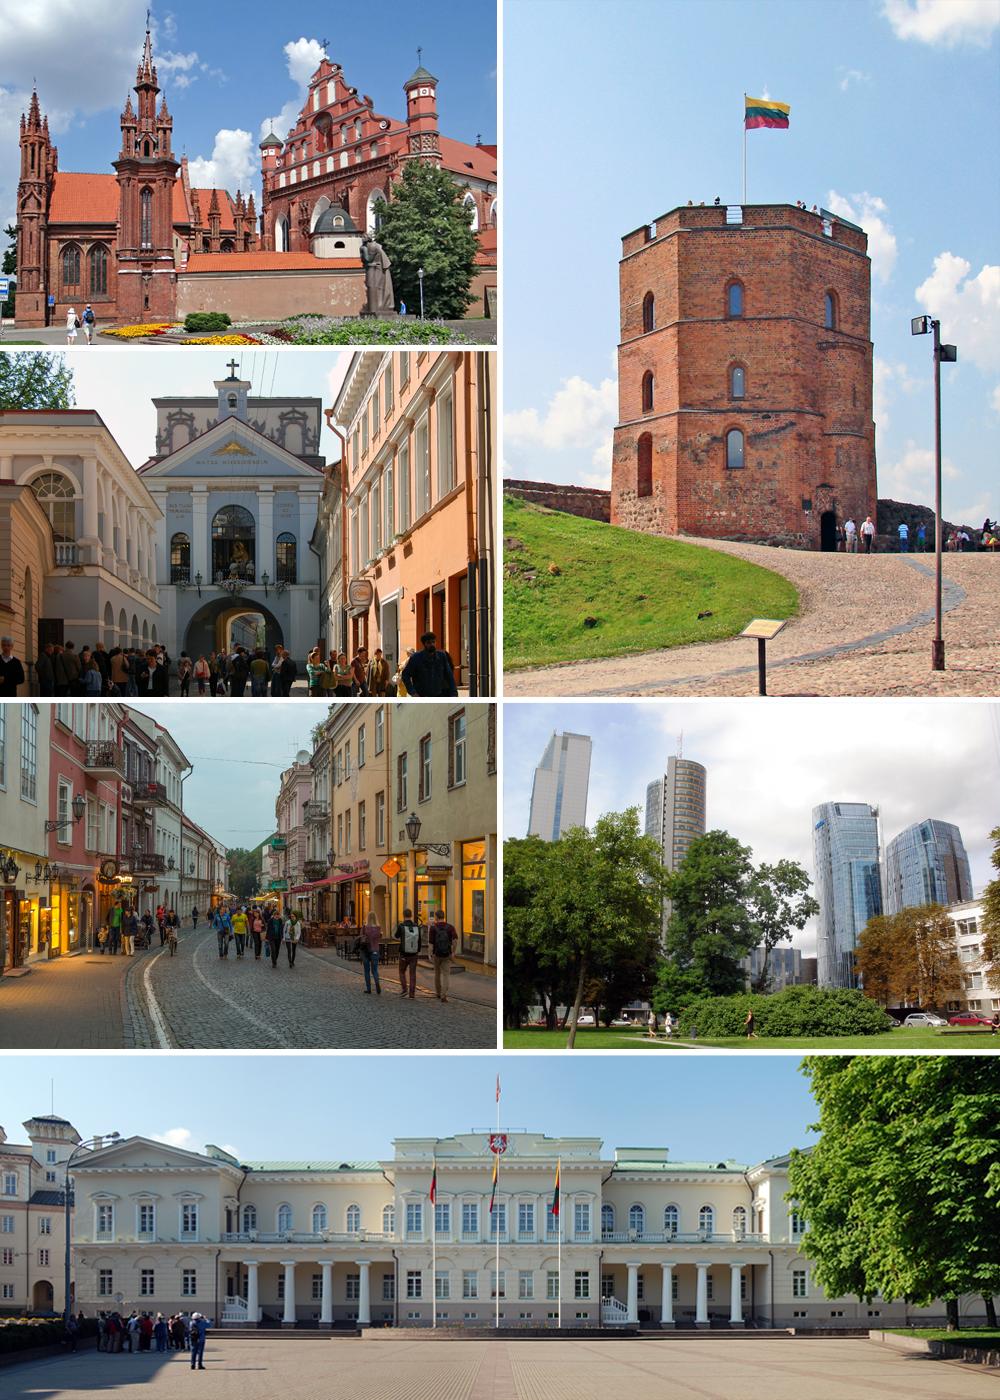 dating sites ukraine free turku